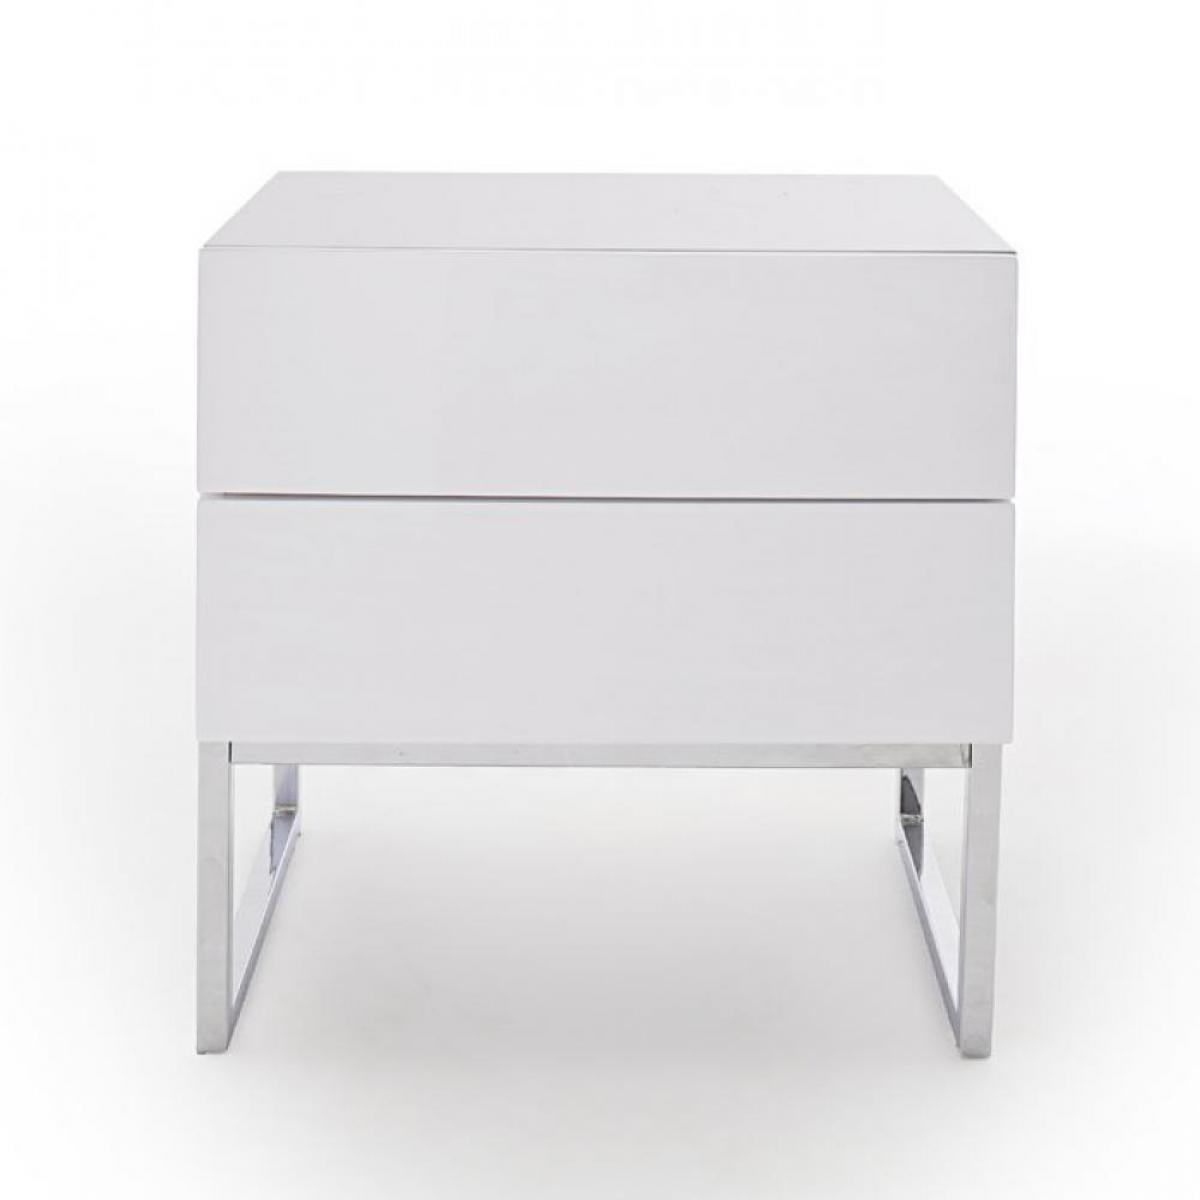 Inside 75 Chevet NOVO laqué blanc brillant pieds chromés 2 tiroirs